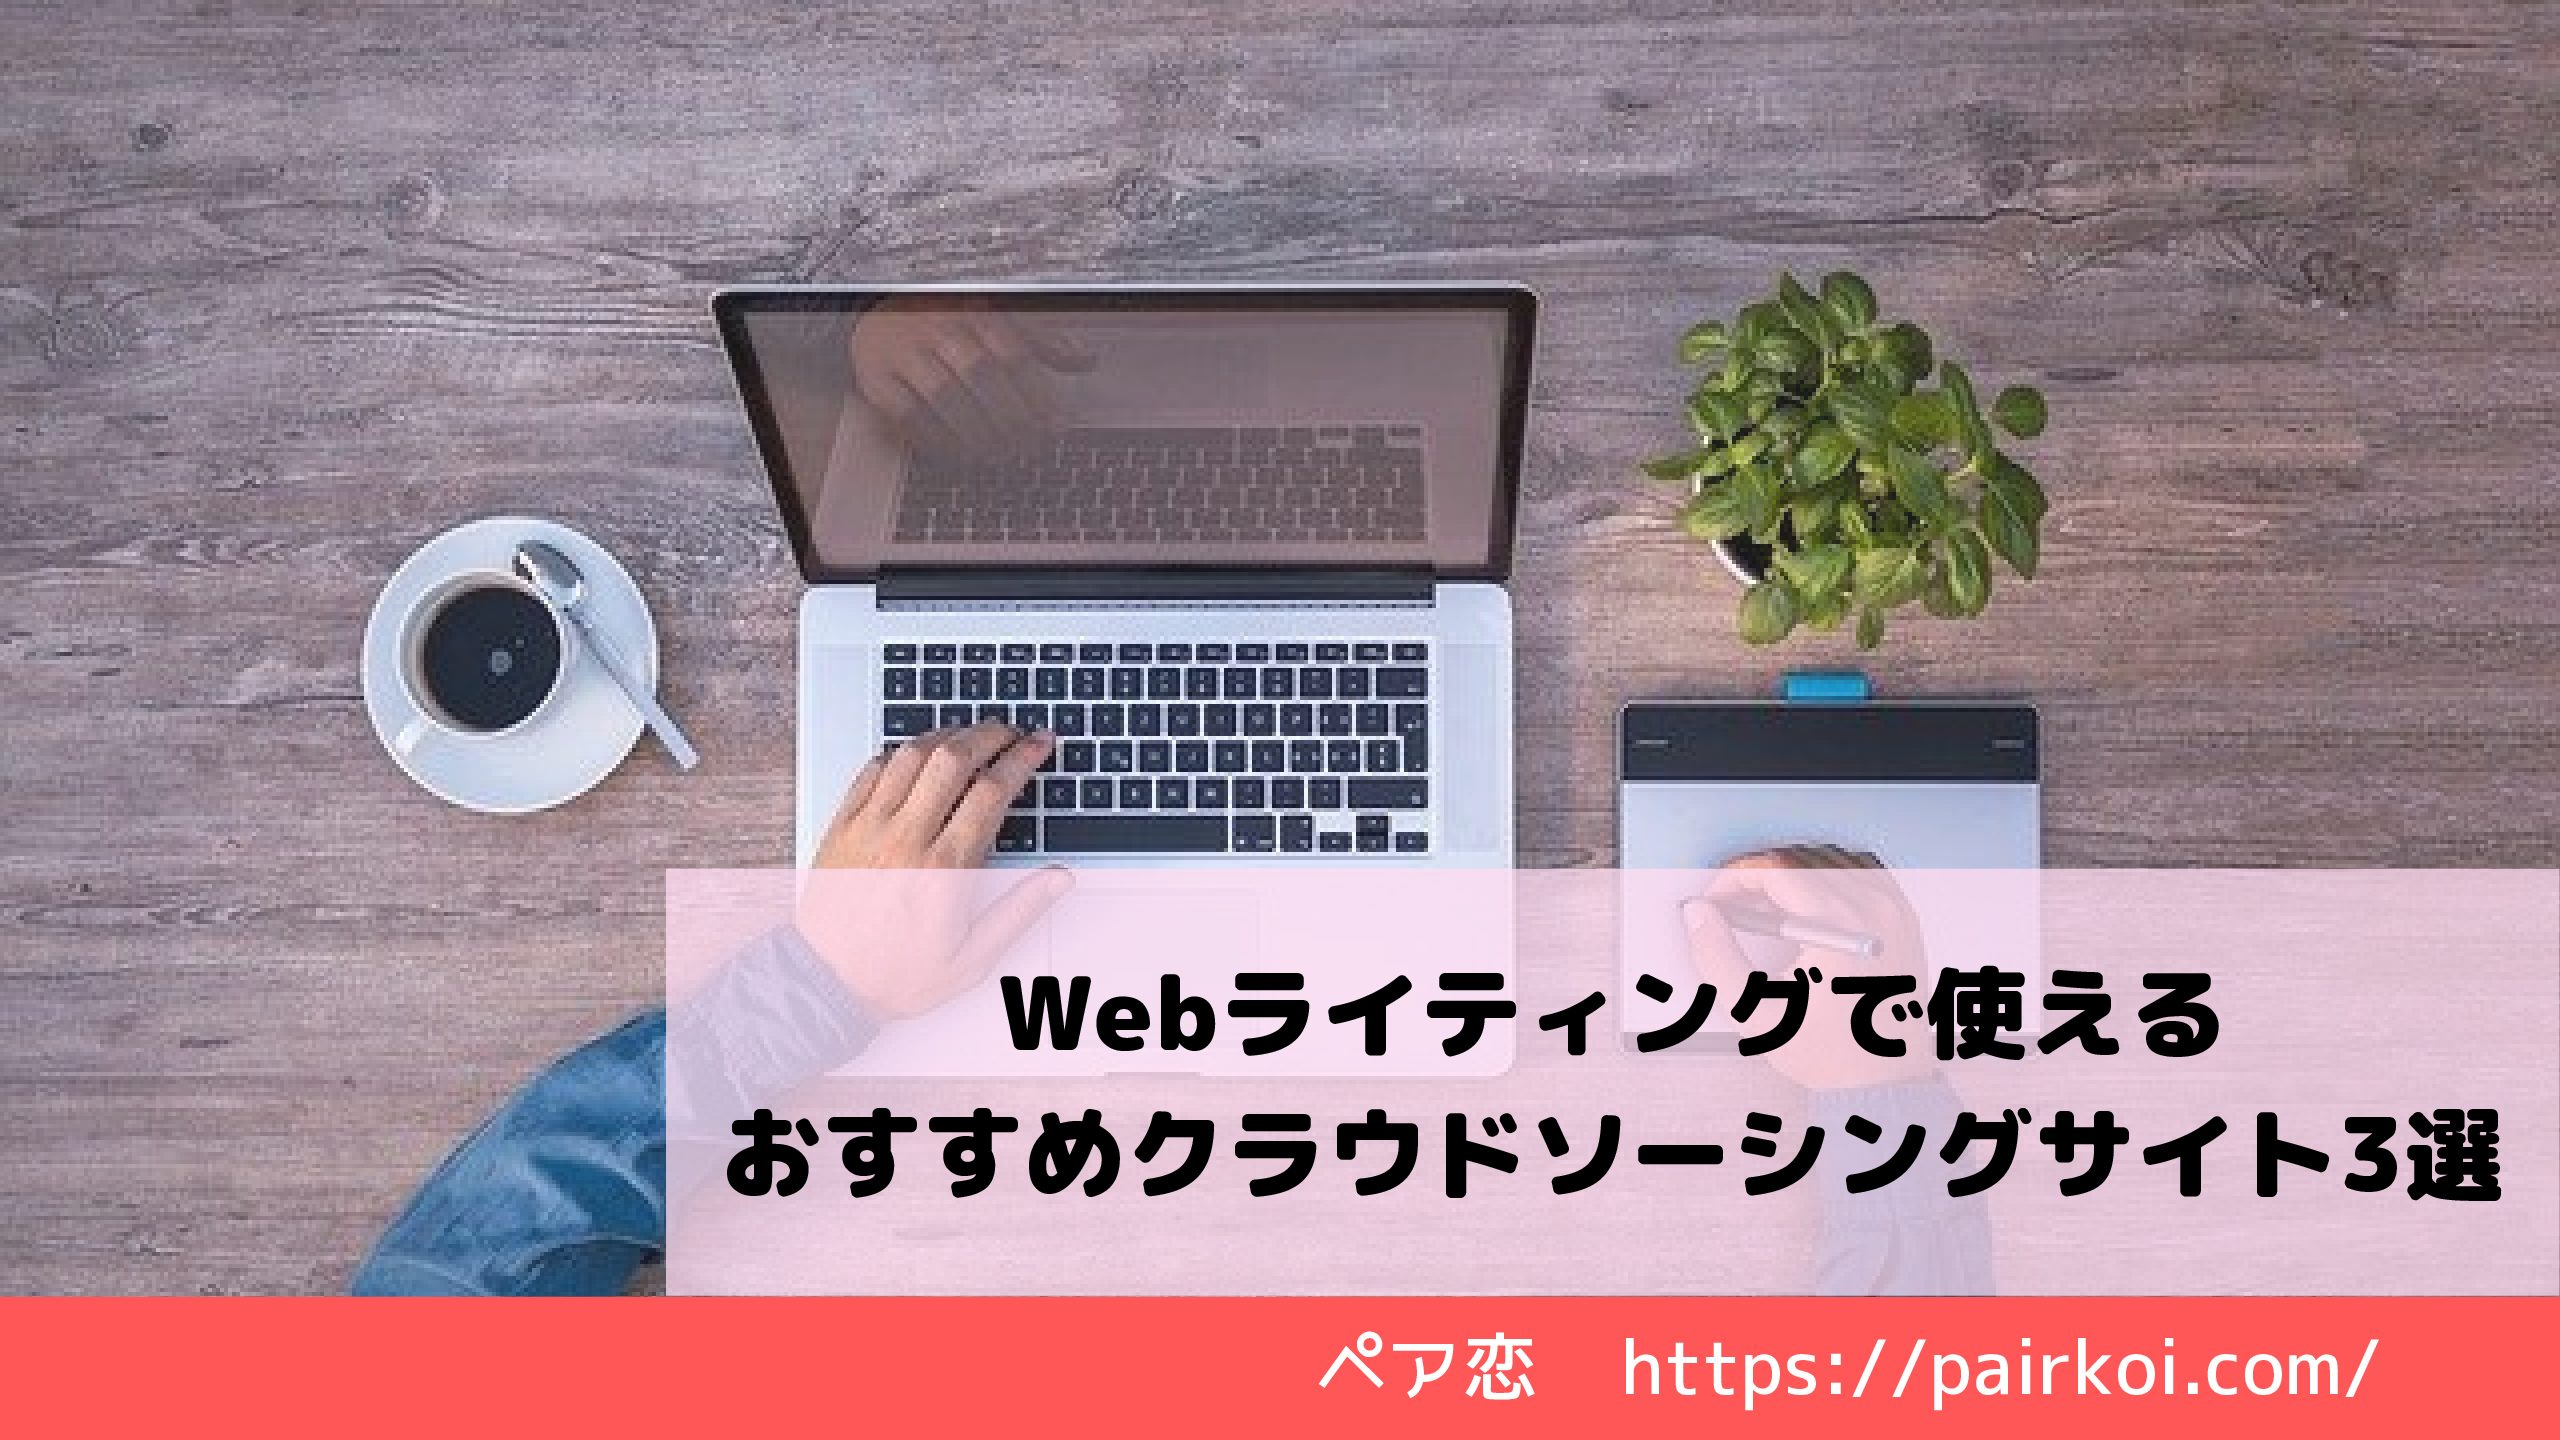 Webライティングで使えるおすすめクラウドソーシングサイト3選